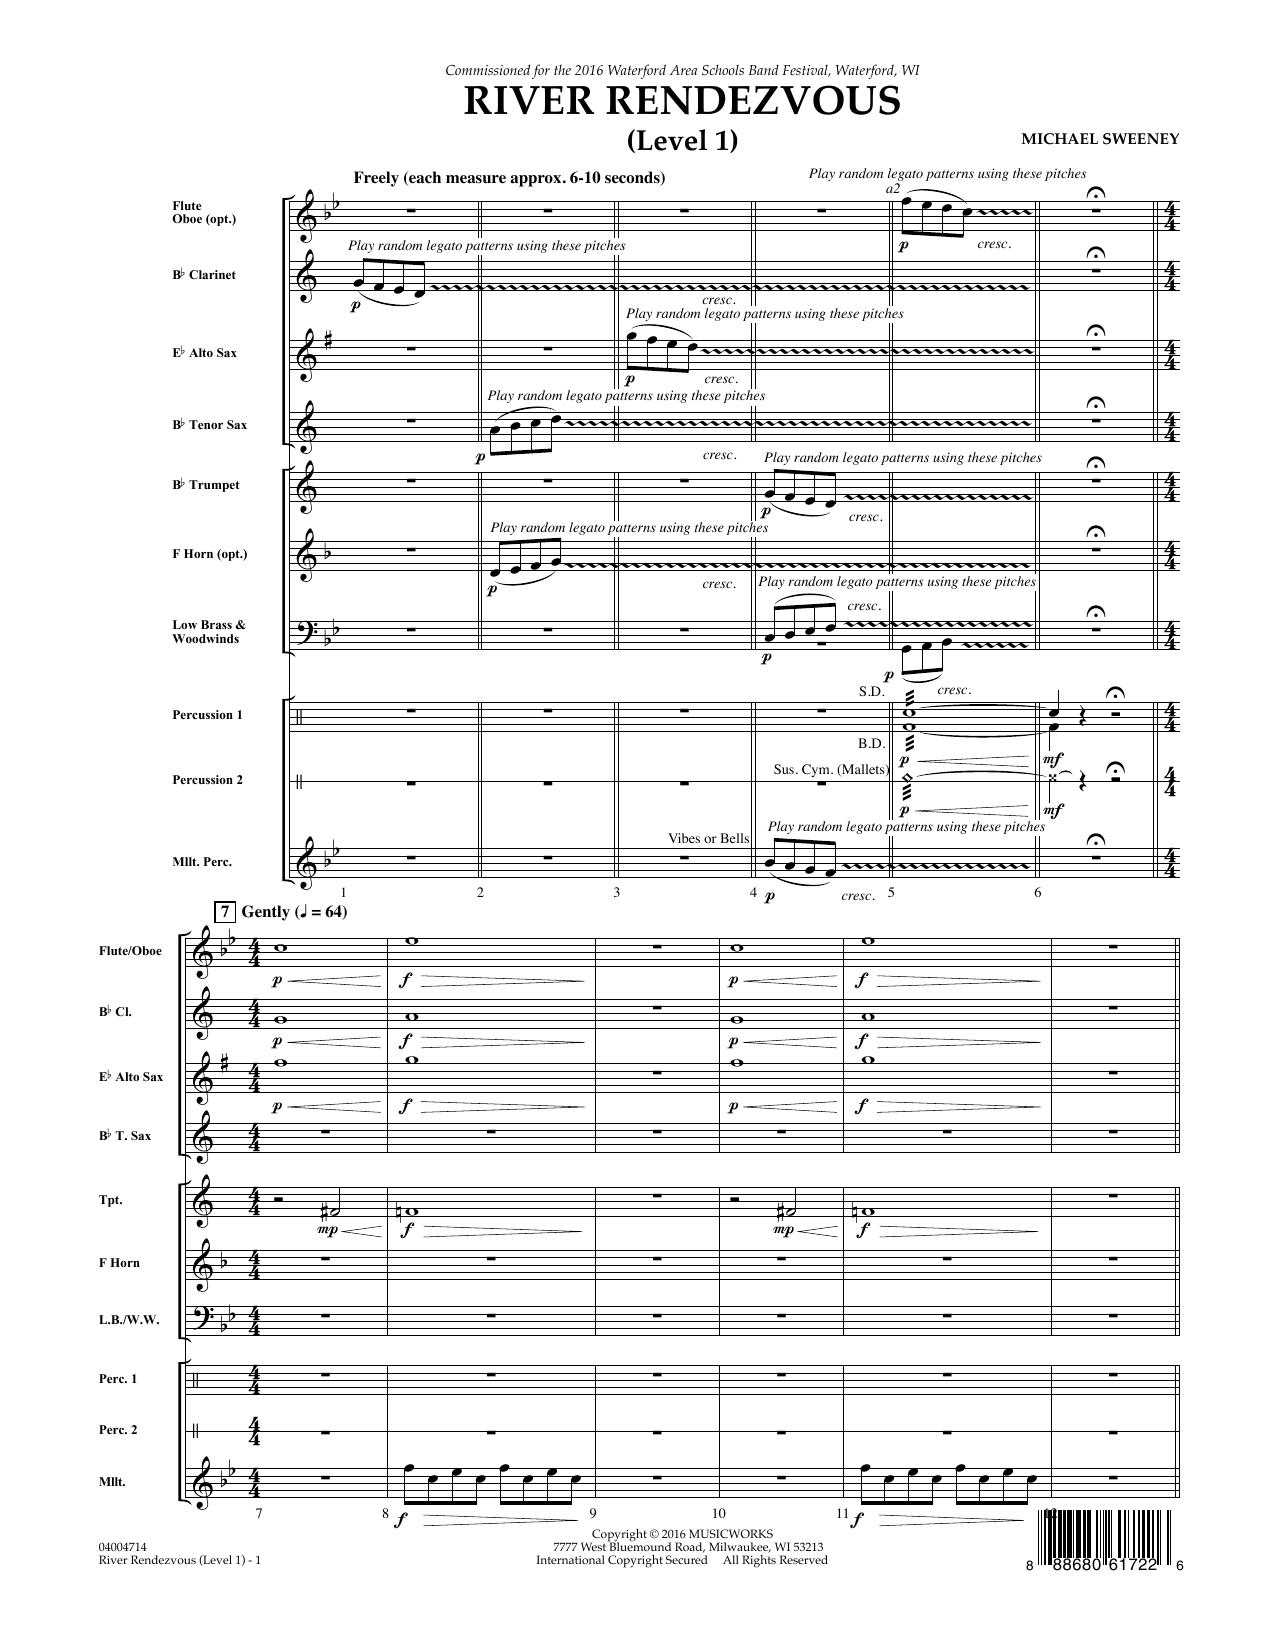 River Rendezvous - Full Score (Level 1) (Concert Band)